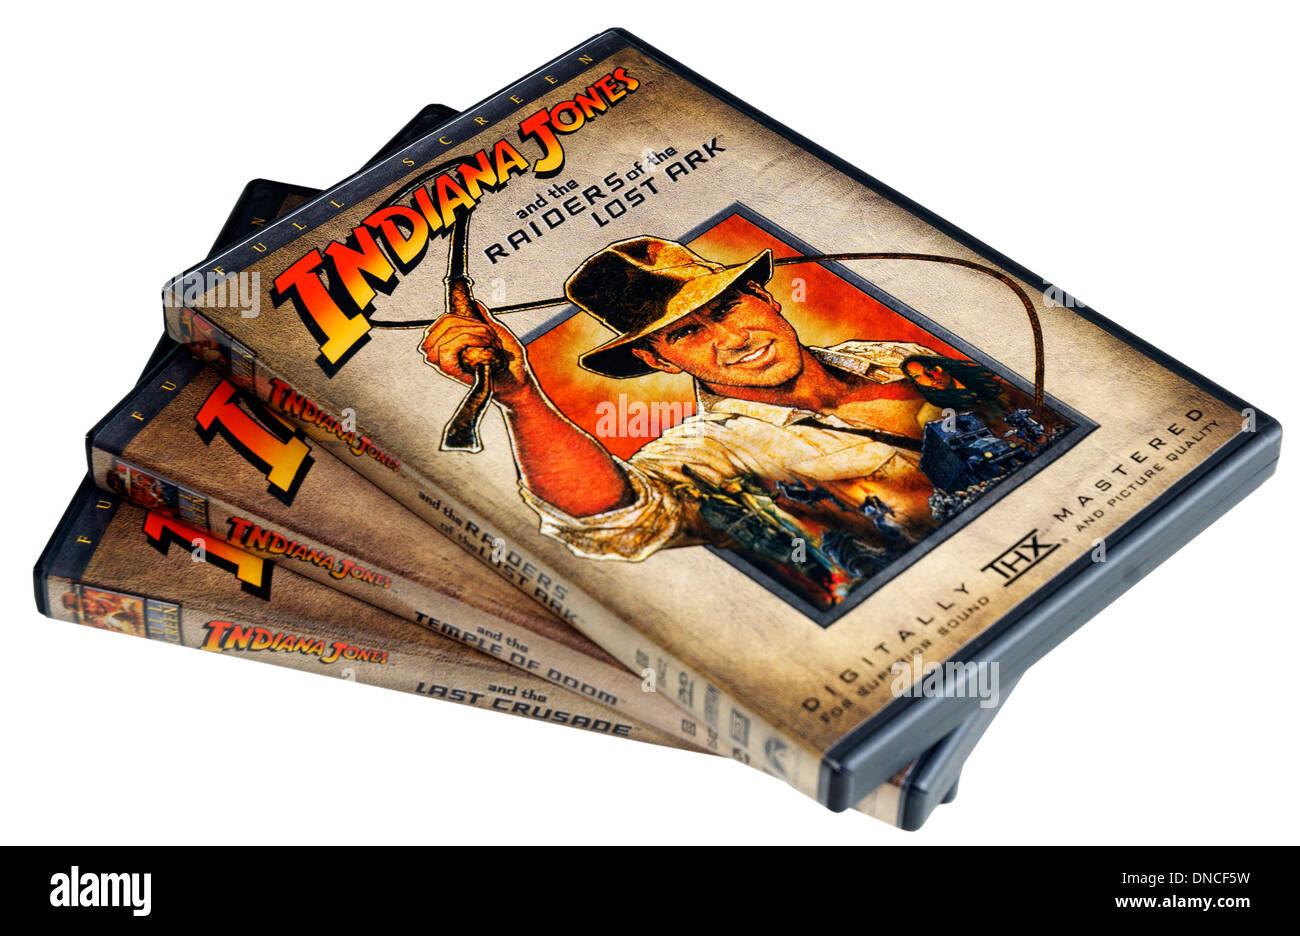 indiana Jones films on DVD - Stock Image